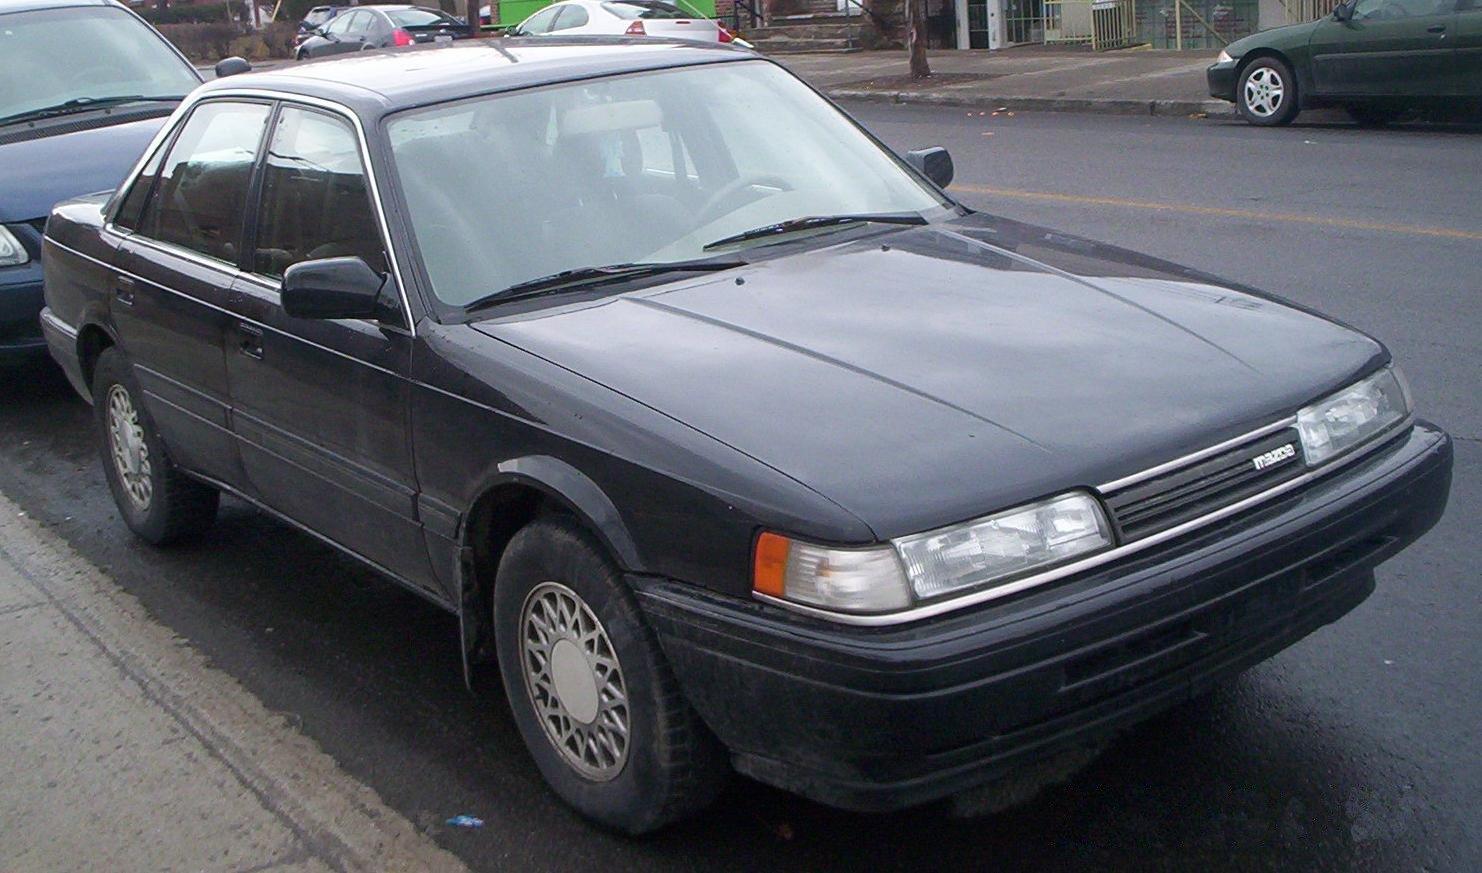 Used 2003 honda accord pricing edmunds autos post for Vip honda nj